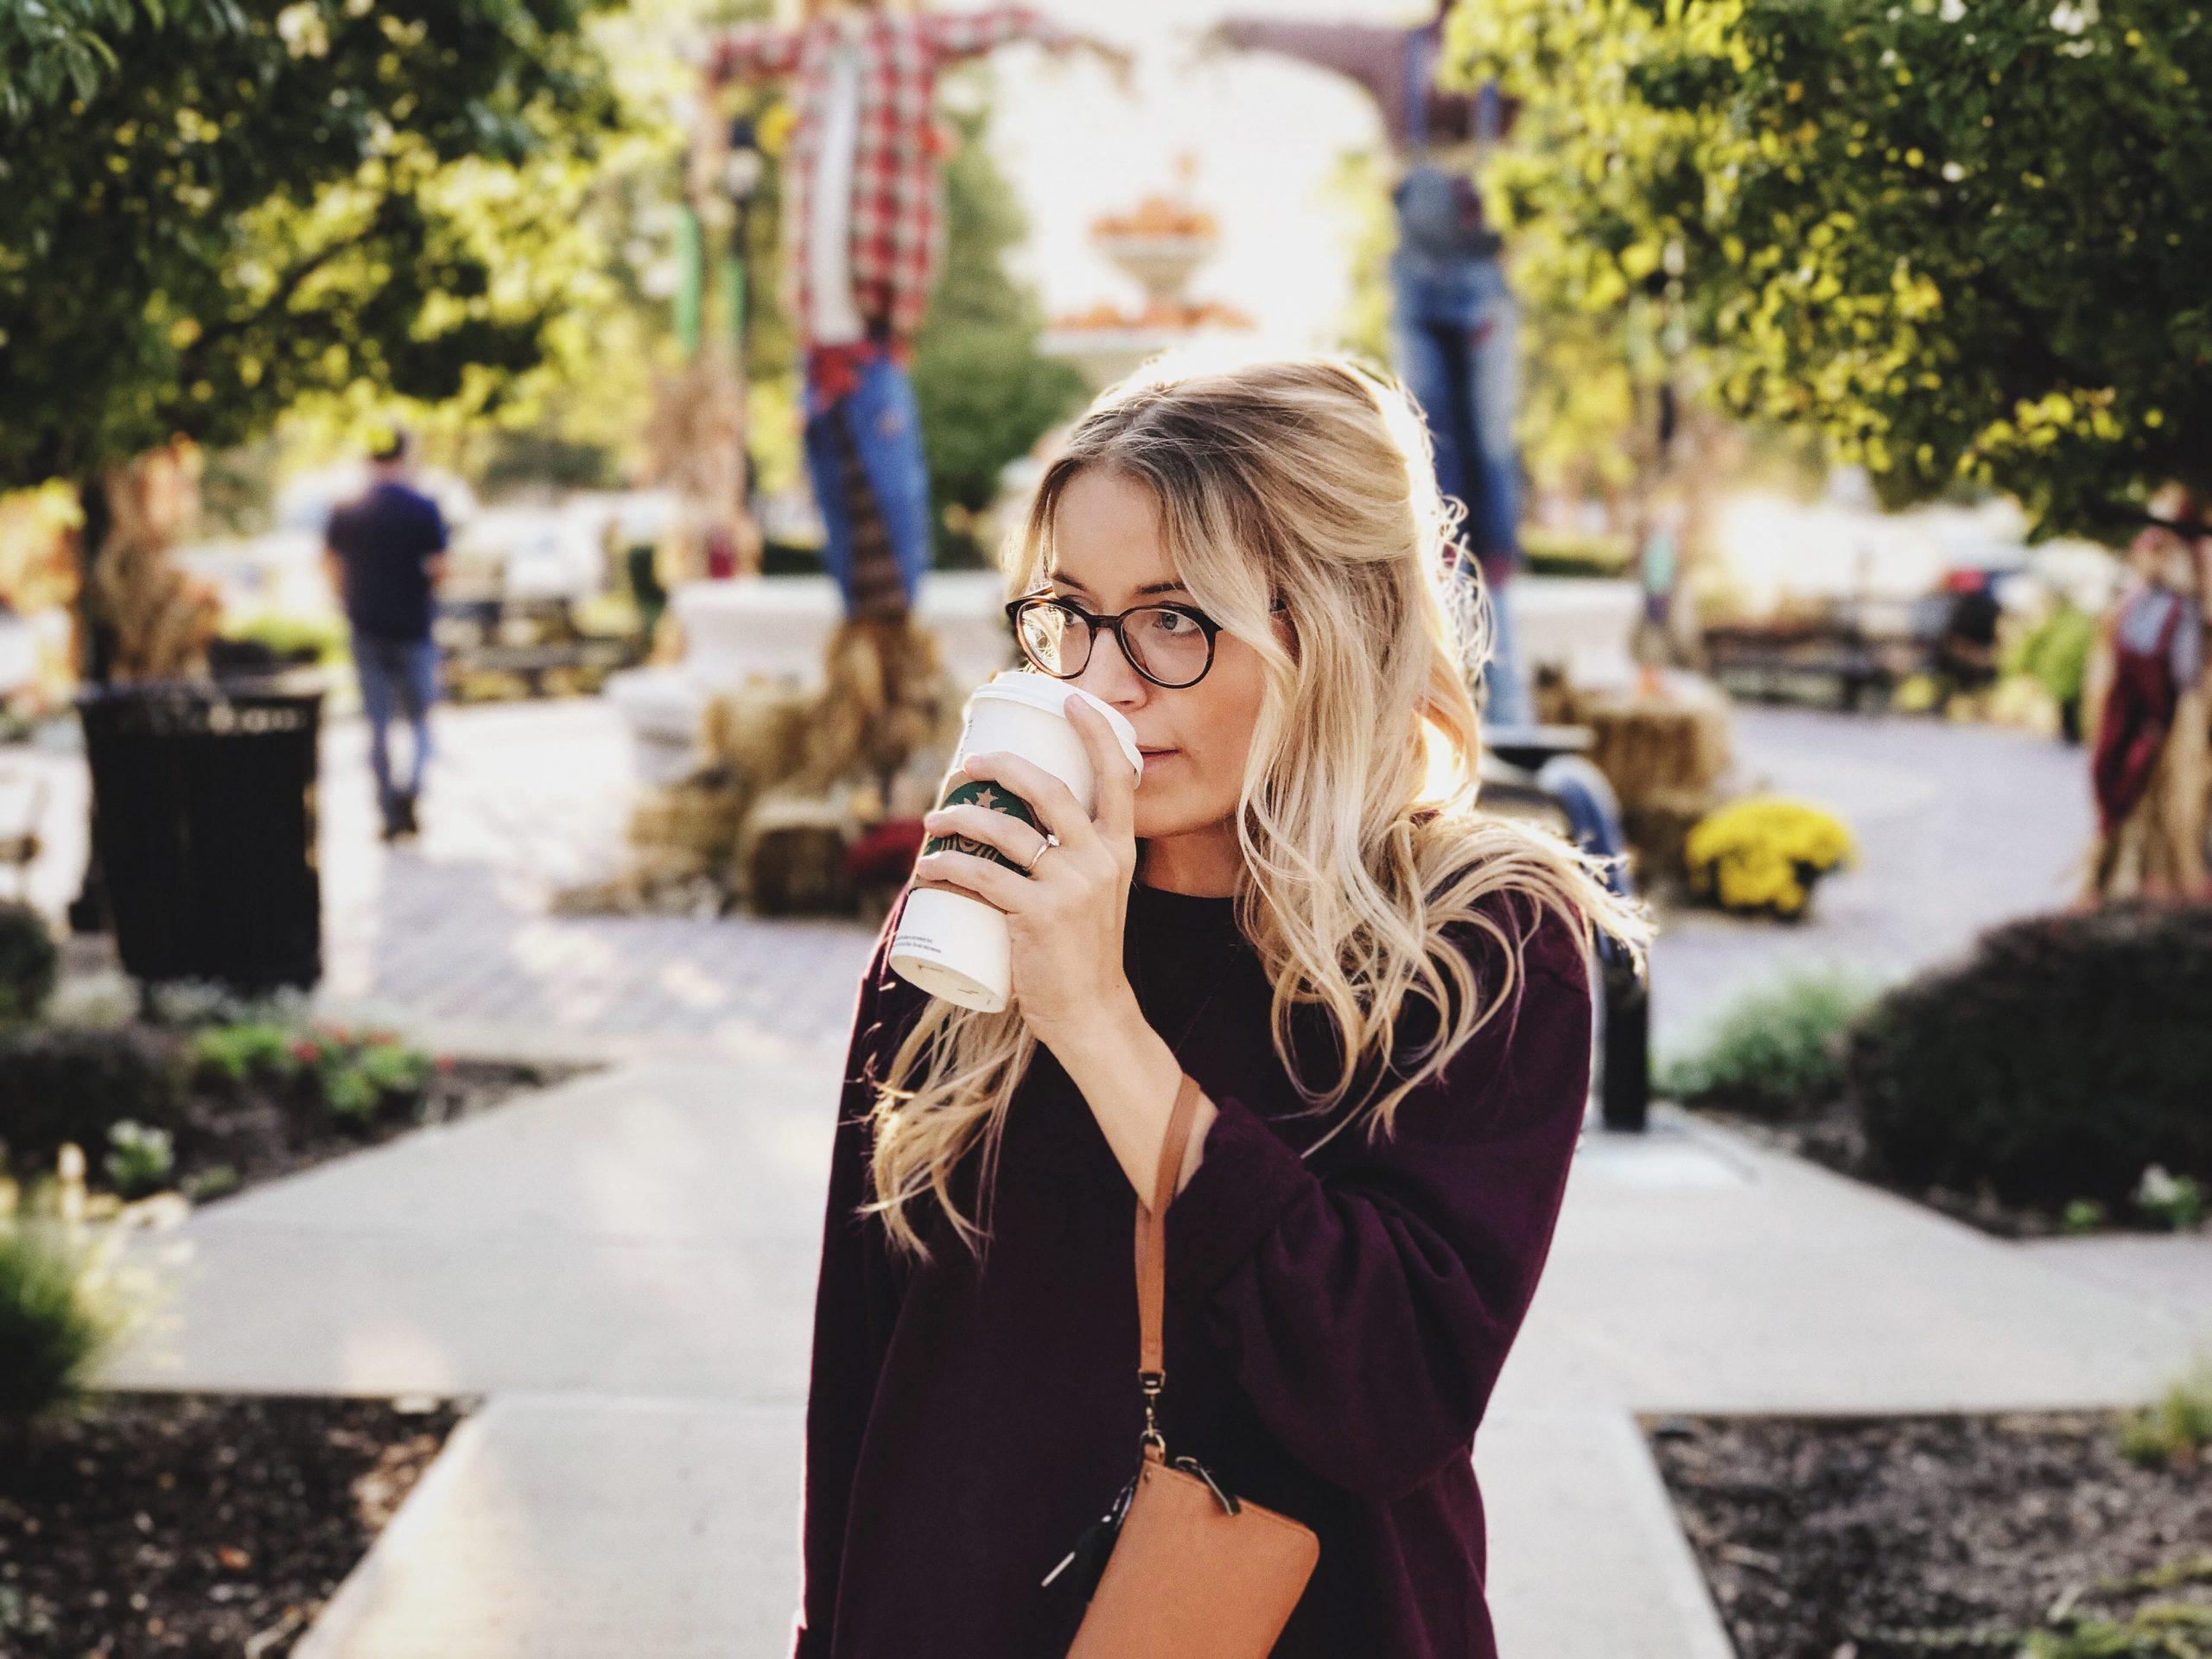 Are Job Posting Ads on Facebook Trustworthy?